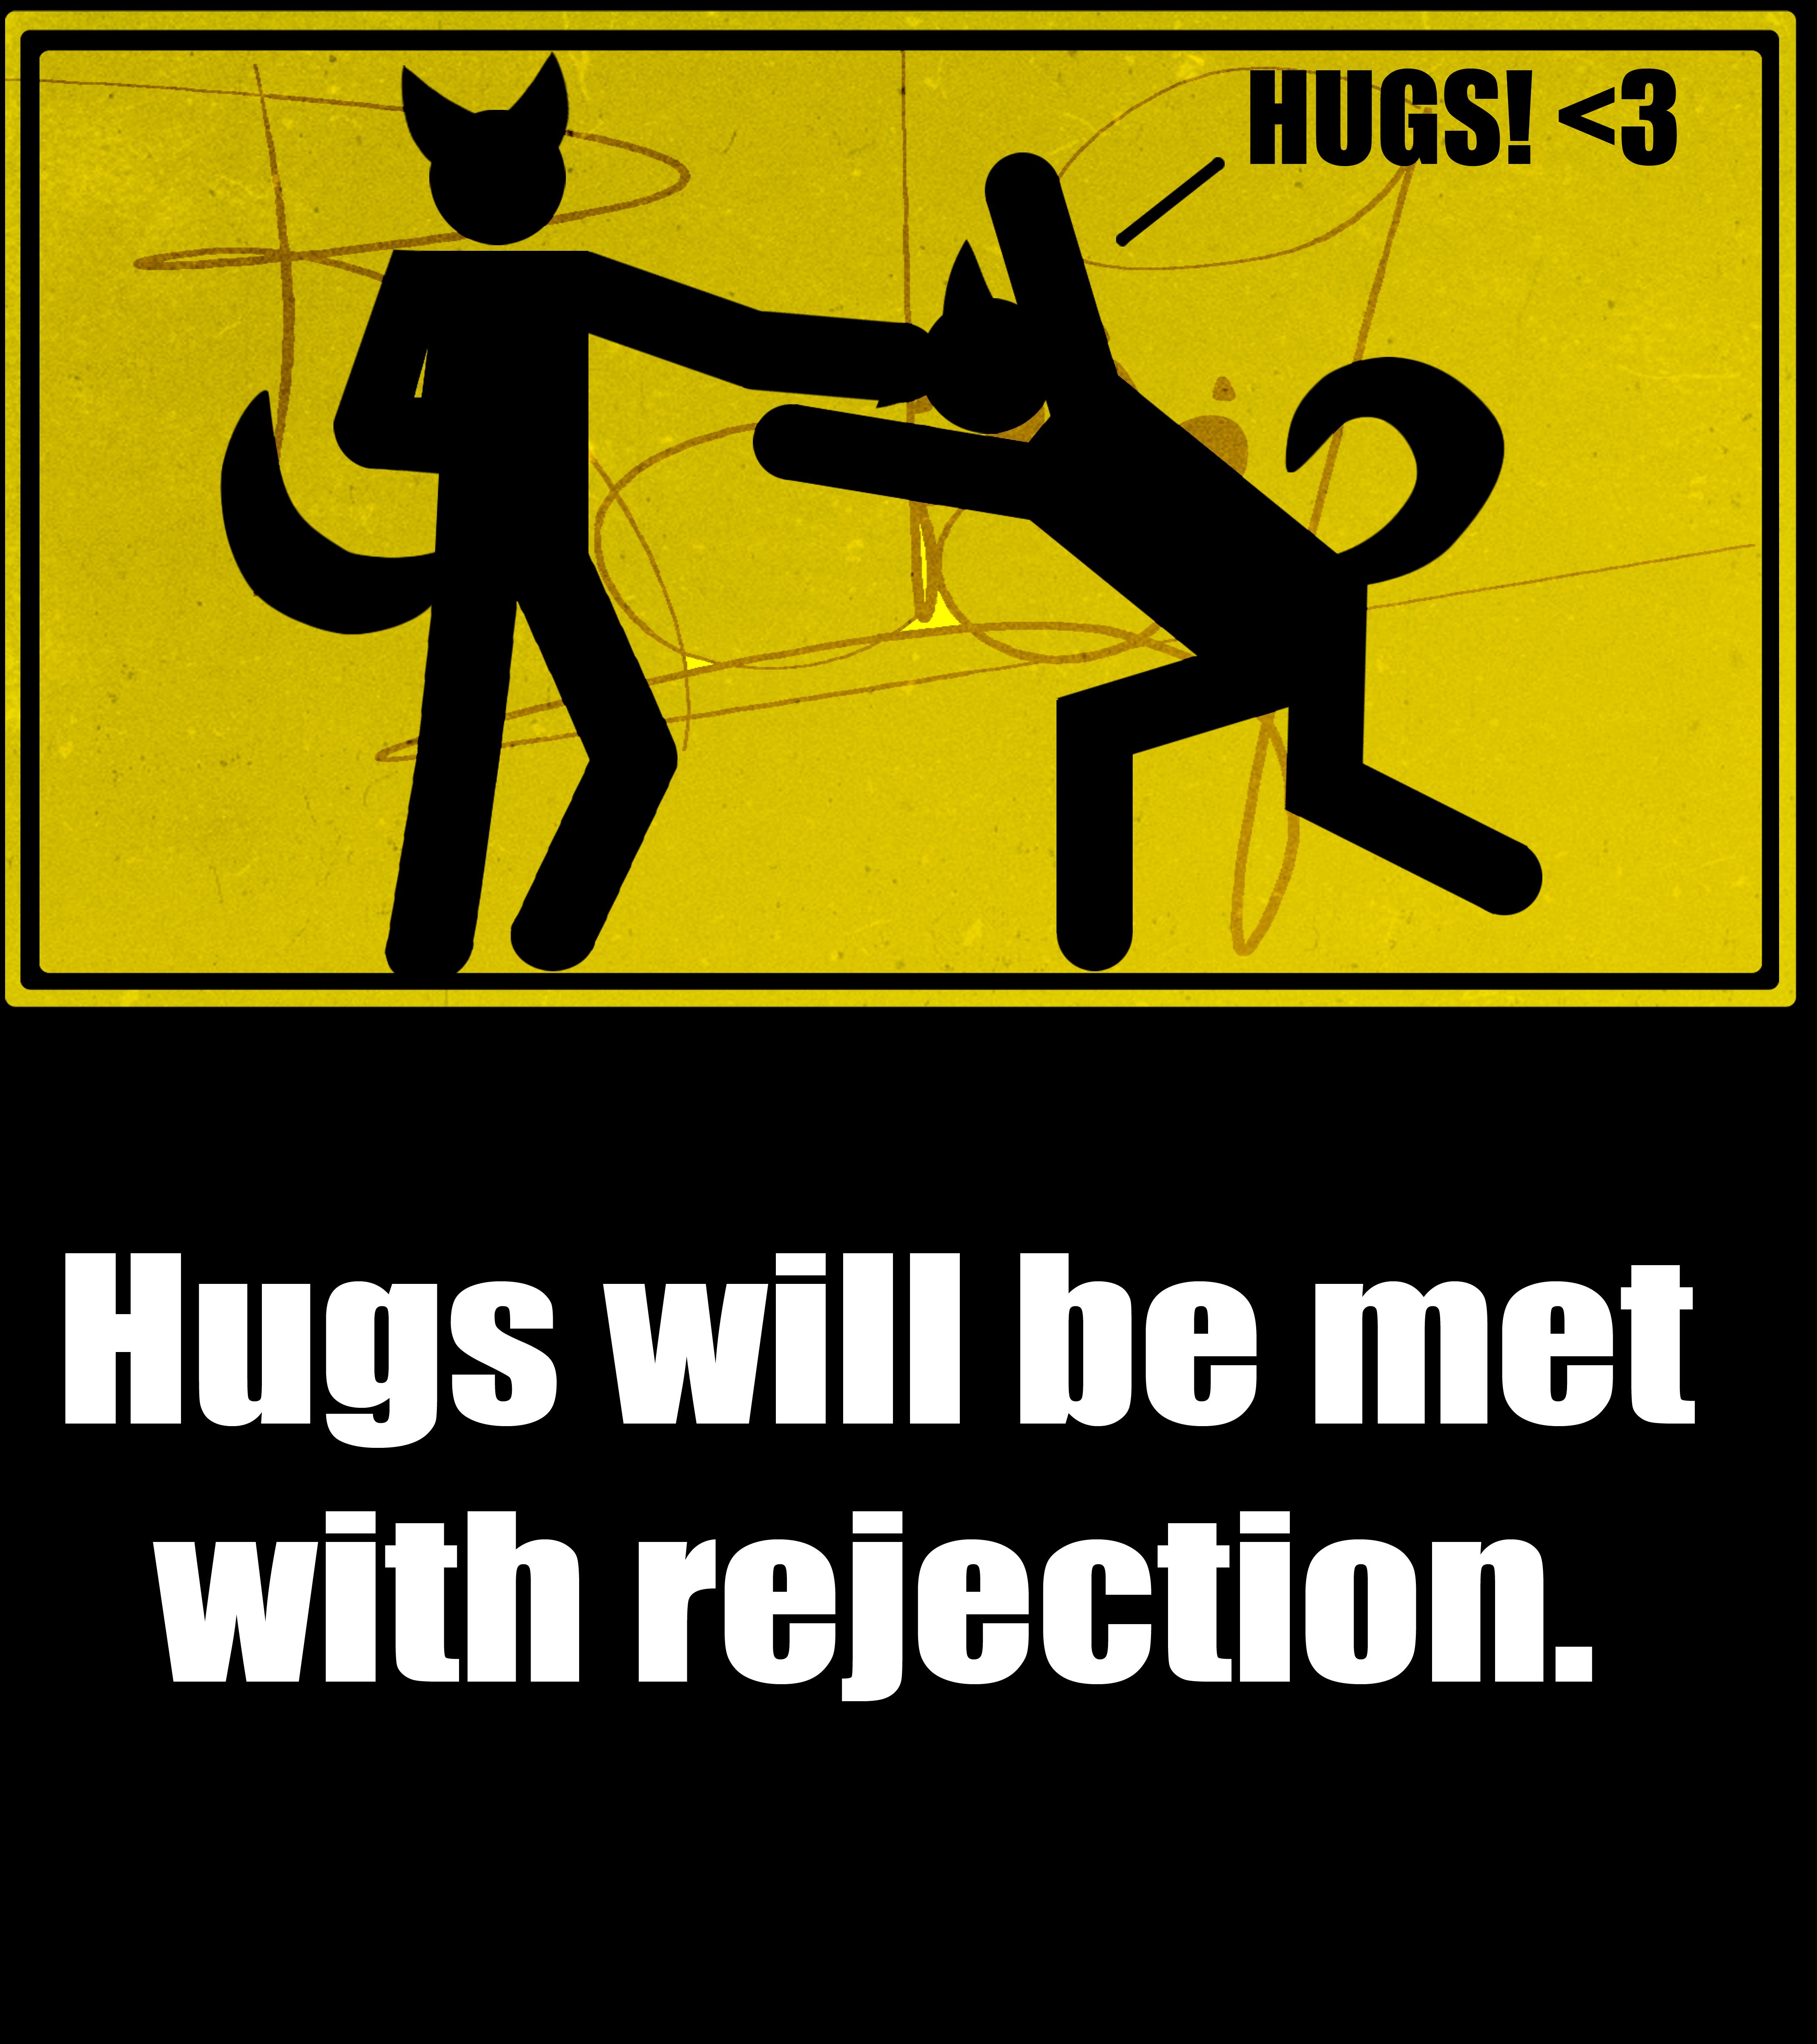 NO HUGS by Shookso